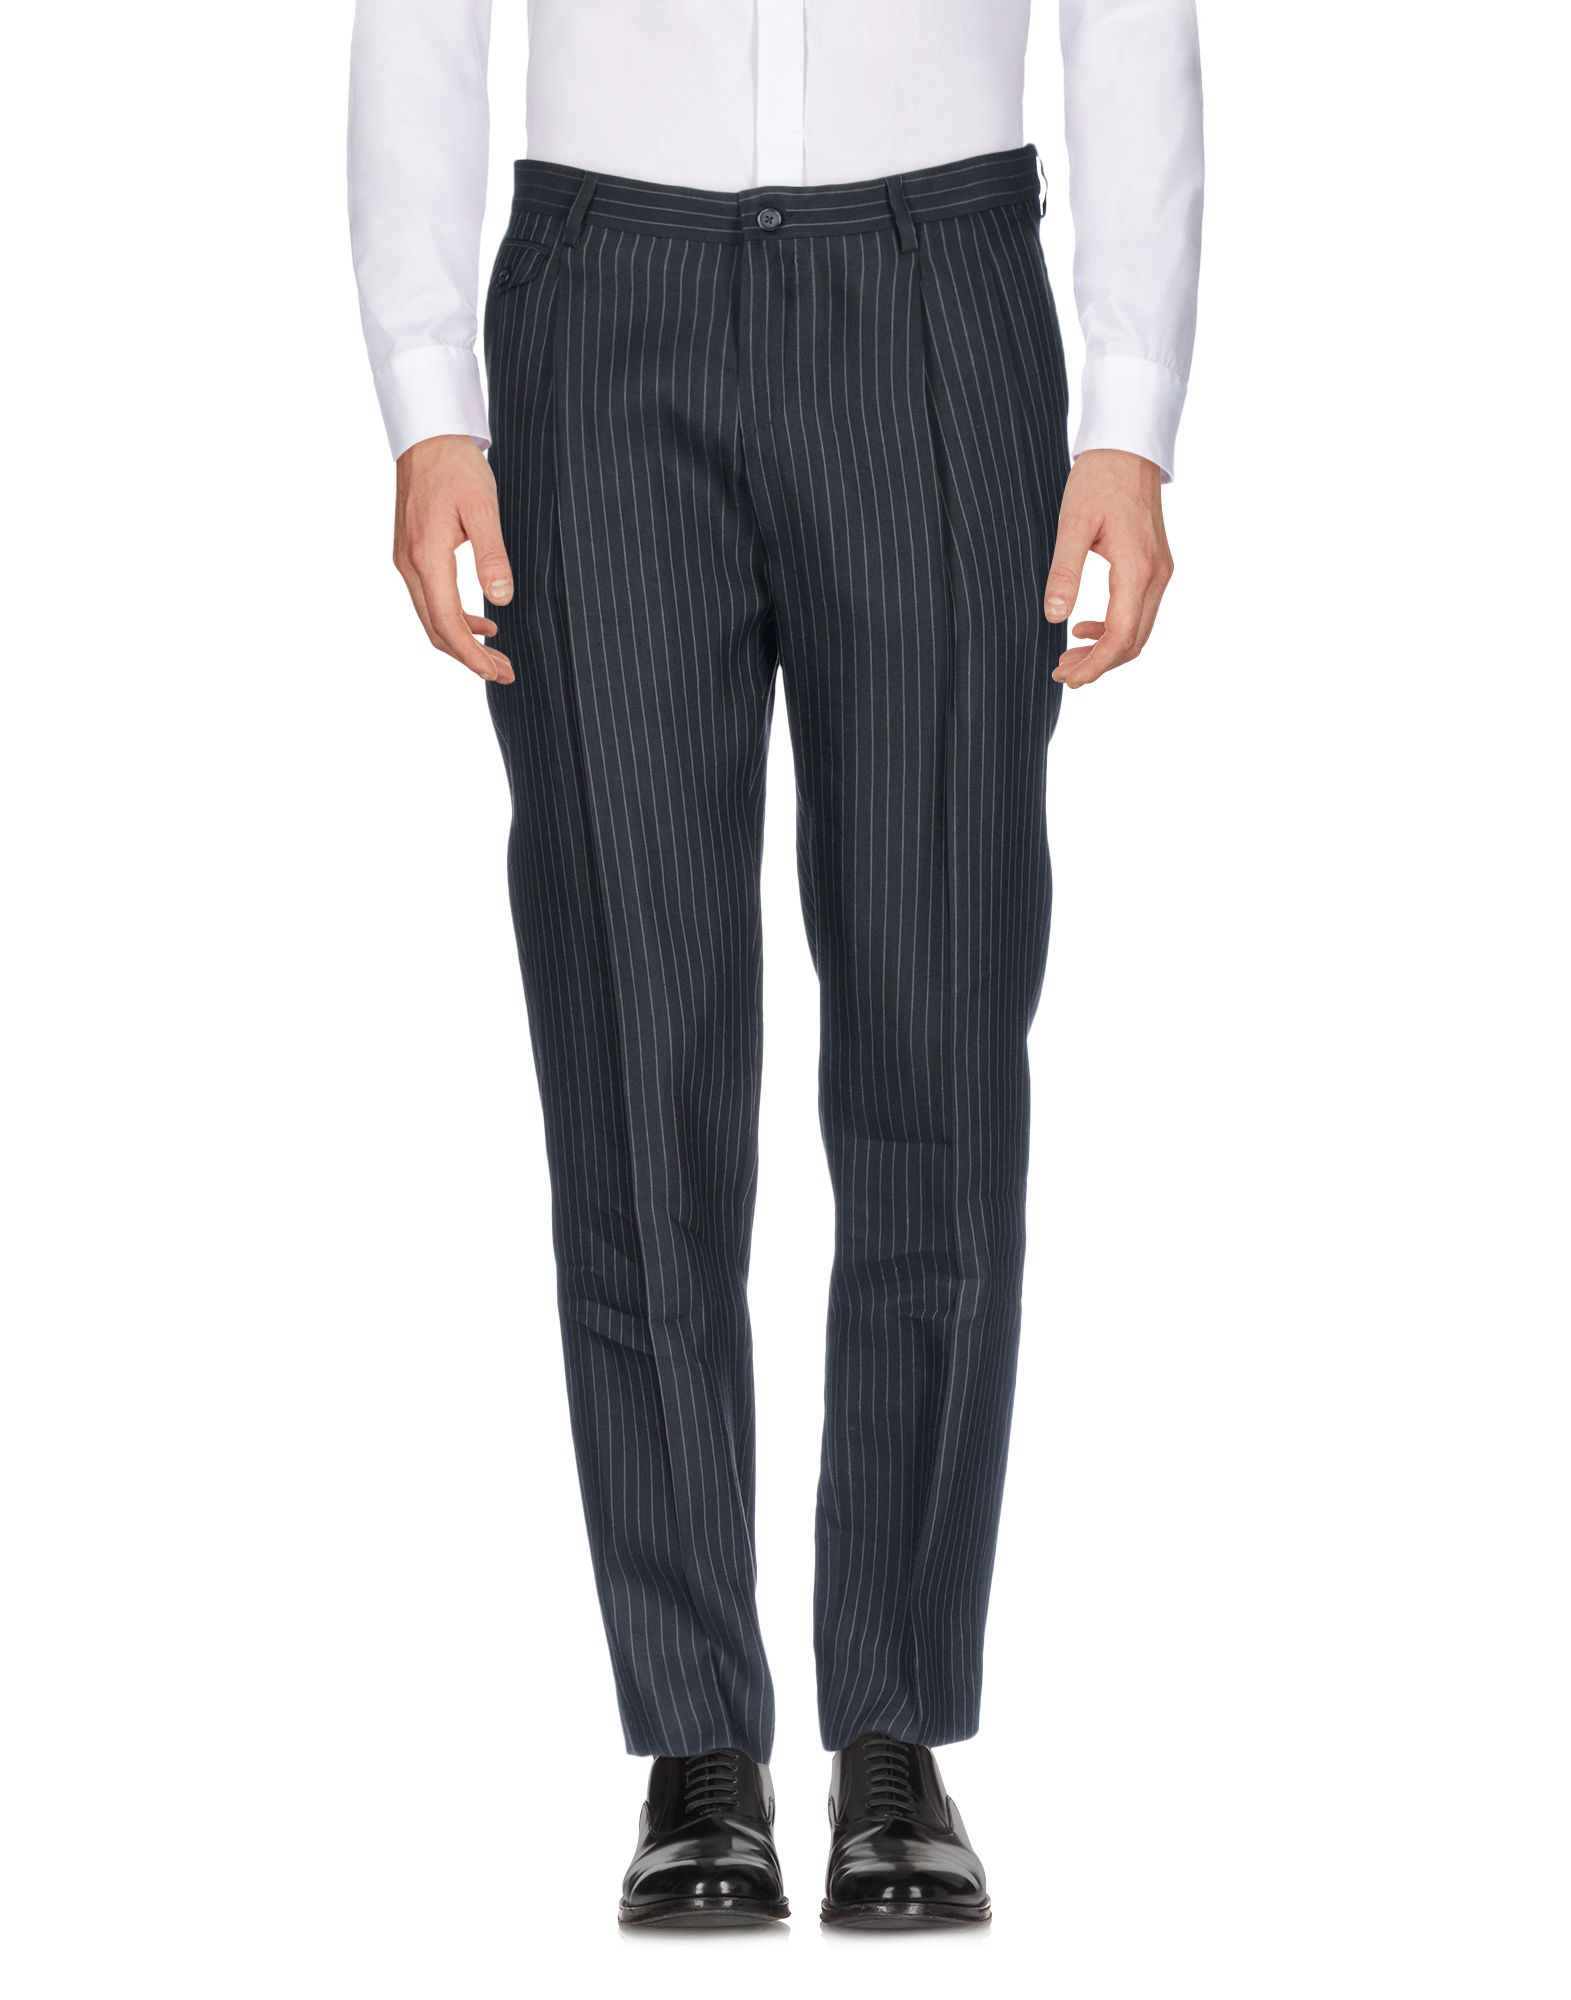 Dolce & Gabbana Casual Pants, Lead